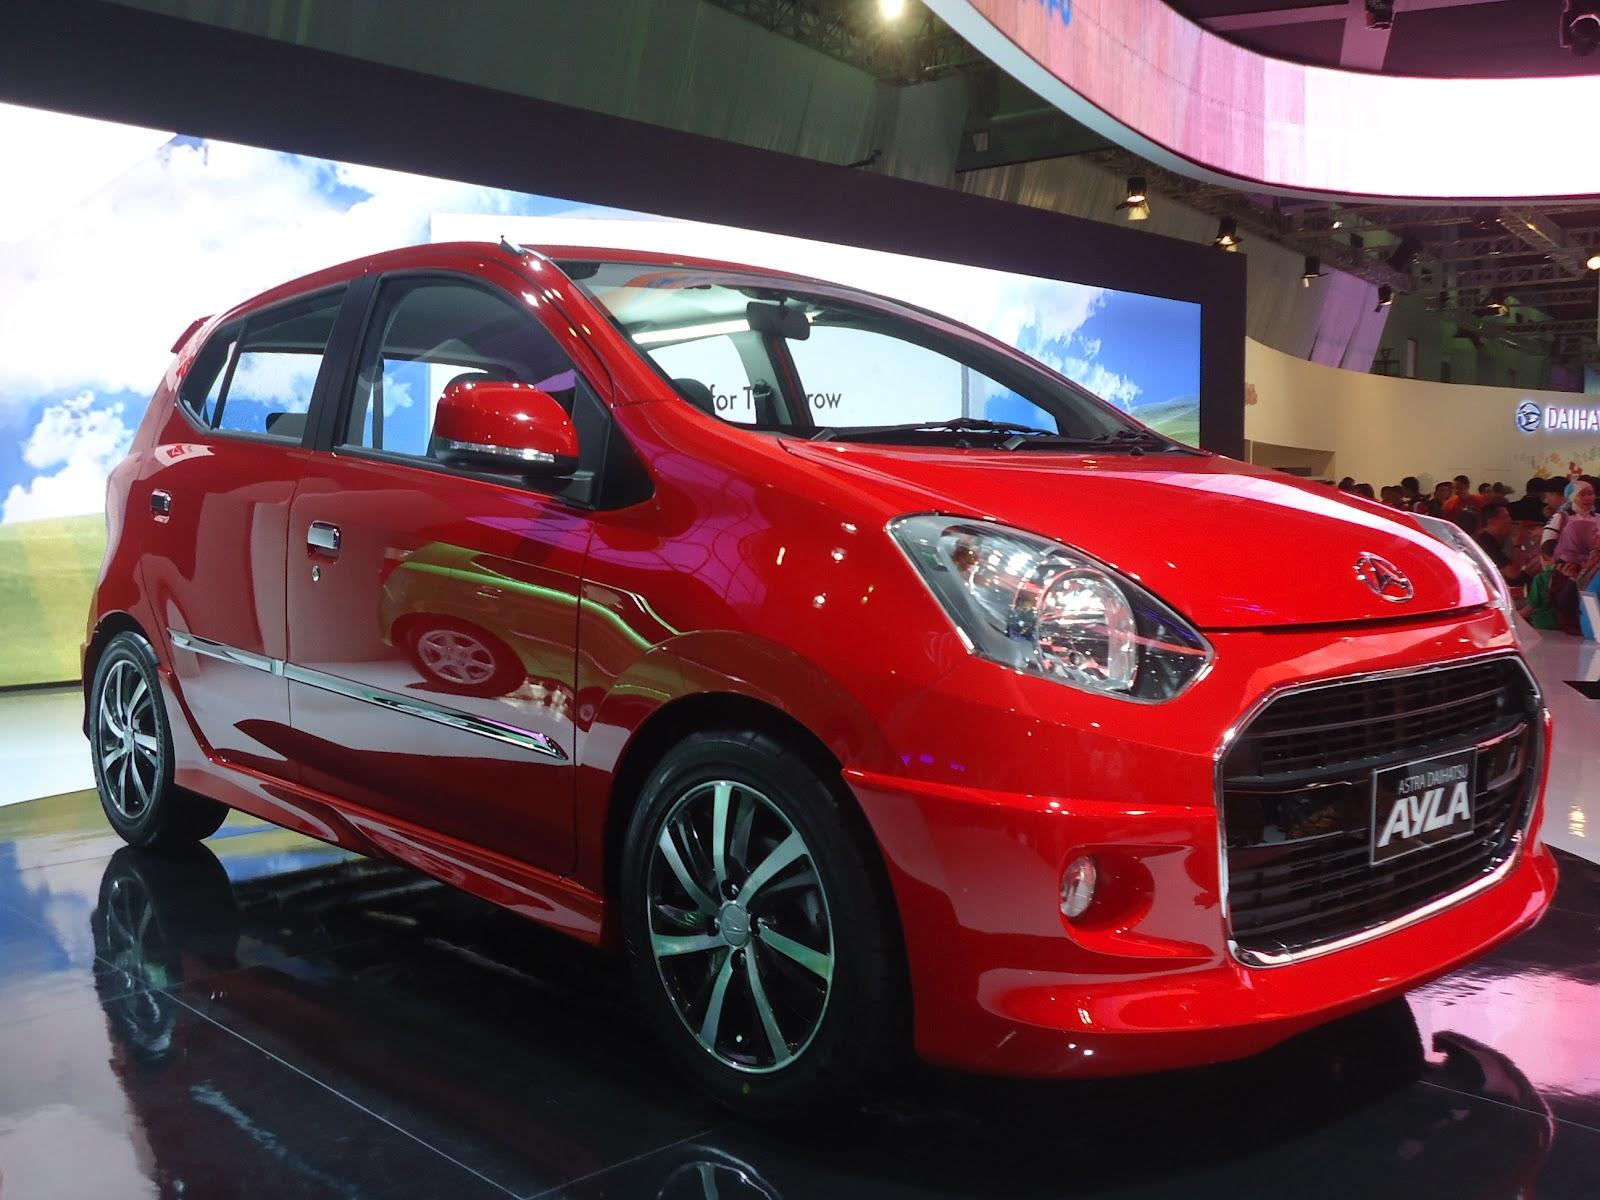 Spesifikasi New Agya Trd Kelebihan Dan Kekurangan Grand Veloz 2016 Herwono Banyu Alas Mobil Murah Toyota Daihatsu